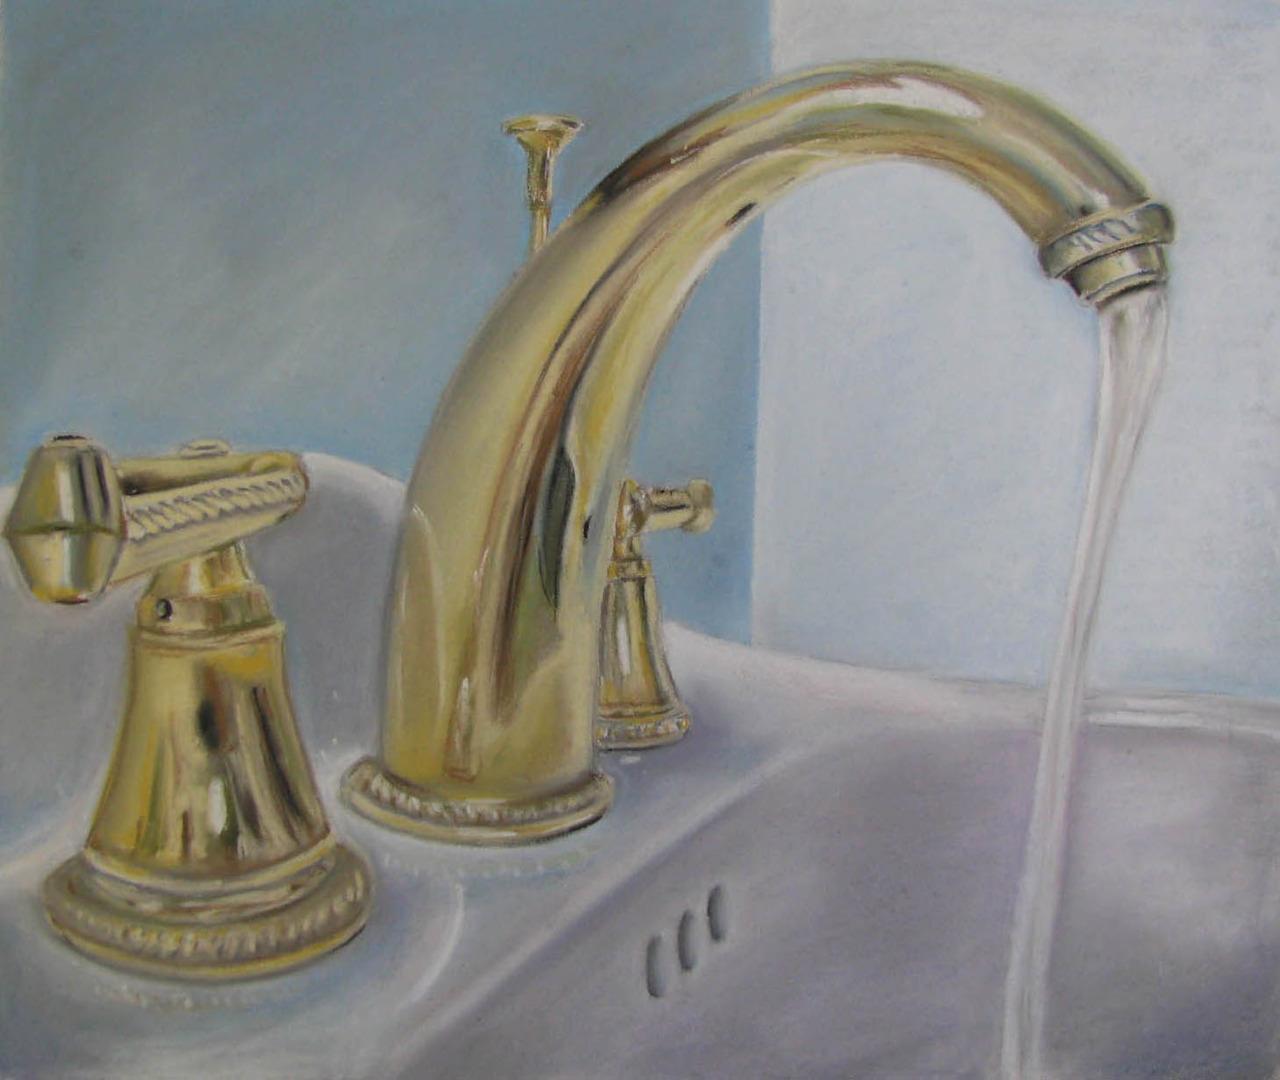 Bathroom Sink   2011. Chalk pastel on paper. 19 x 25.